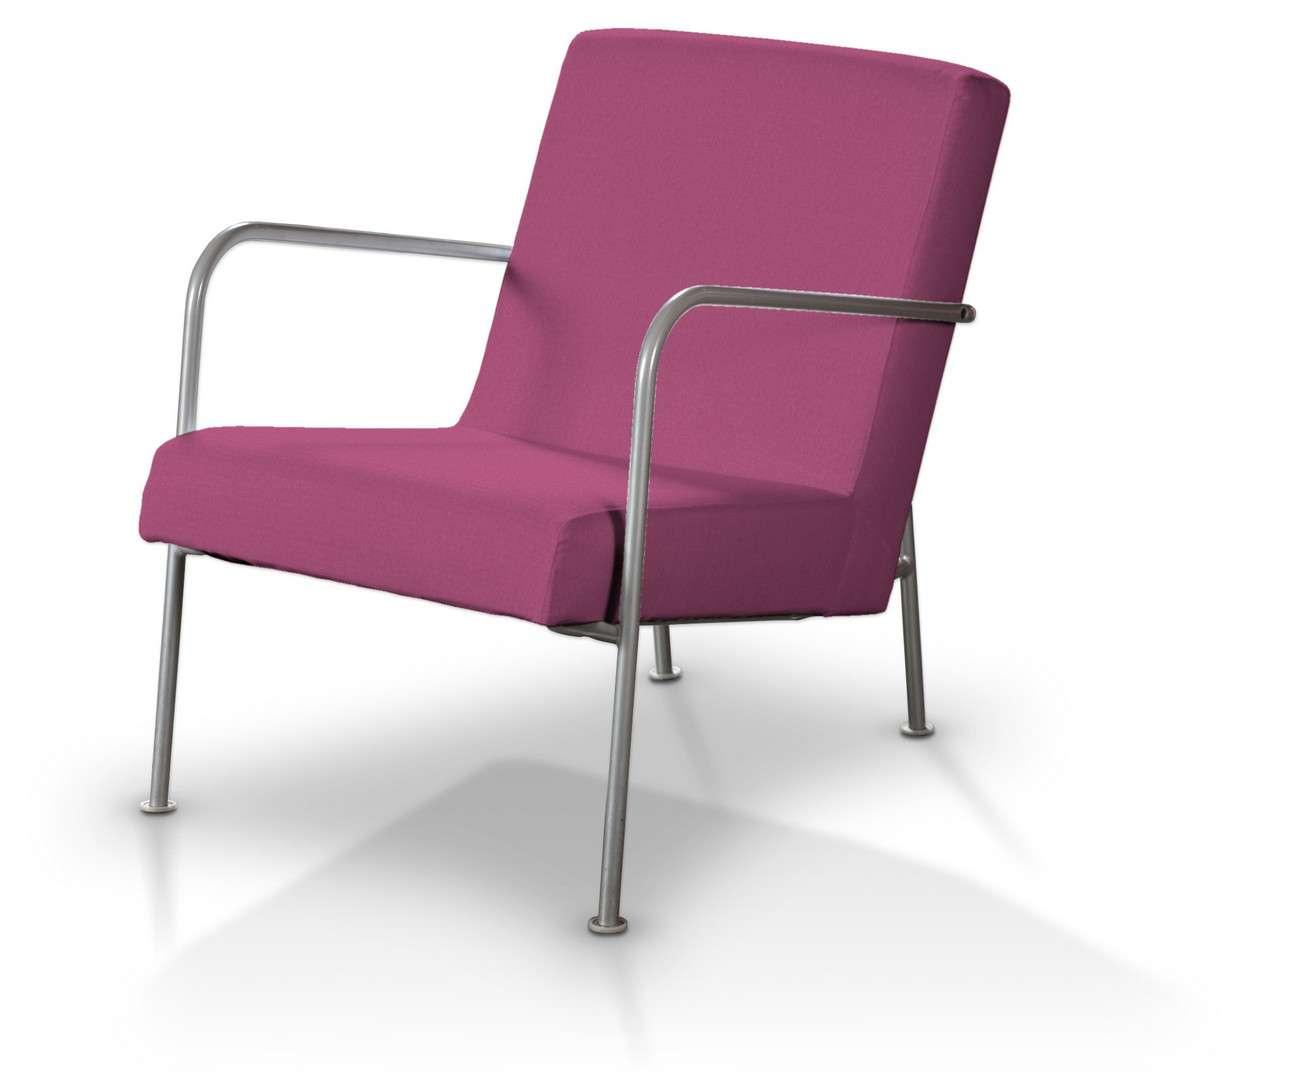 Potah na křeslo Ikea PS v kolekci Living II, látka: 161-29